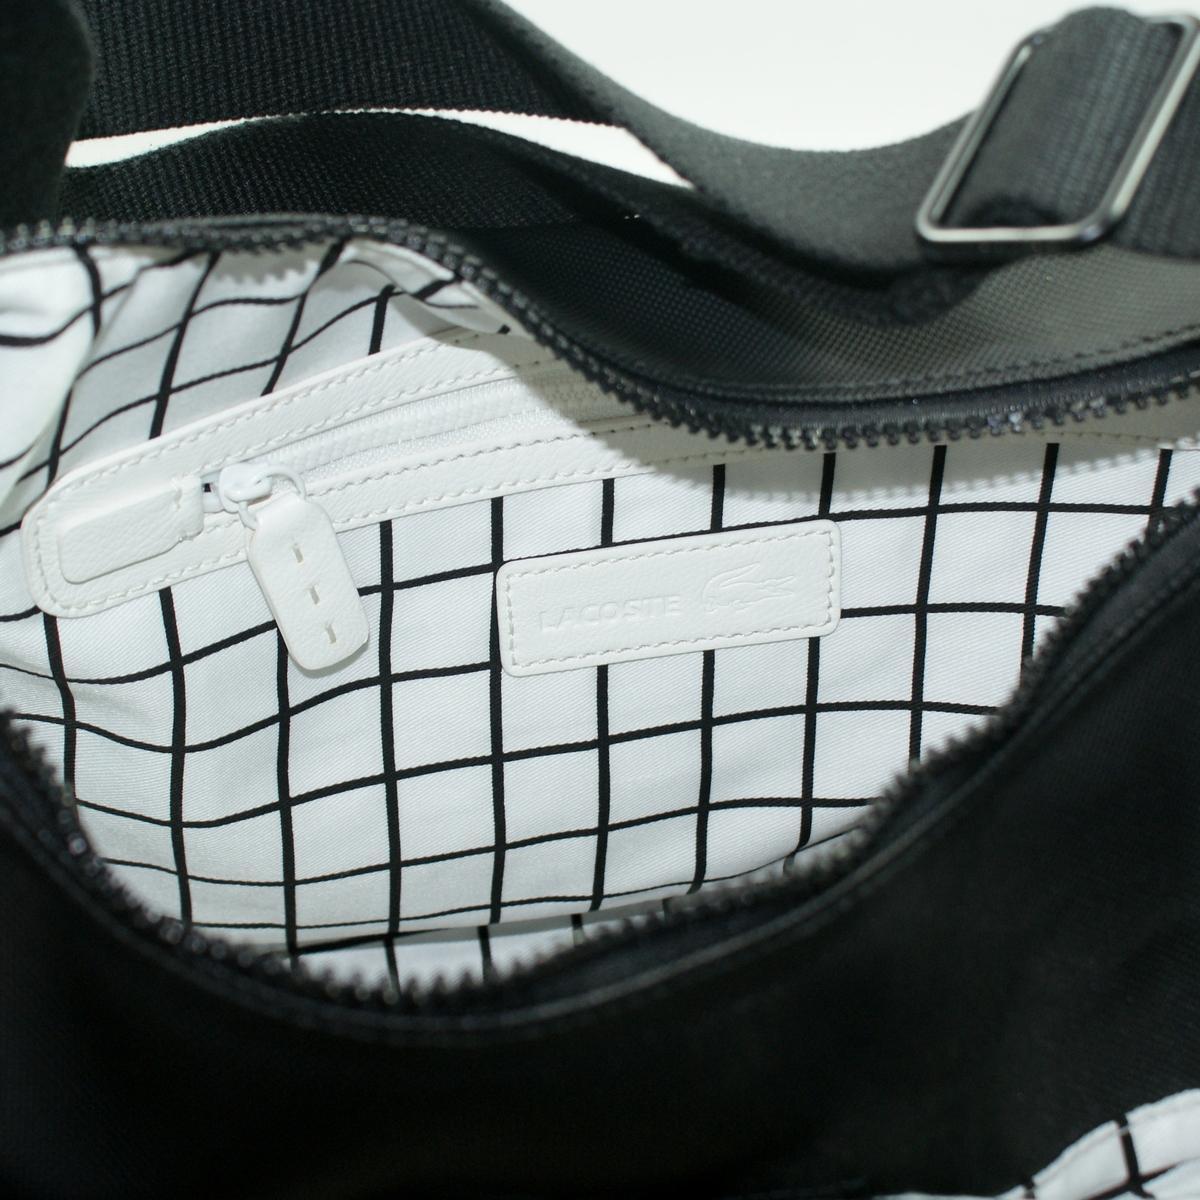 Lacoste Black Iris Hobo Bag Crossbody Bag Nf0192nc